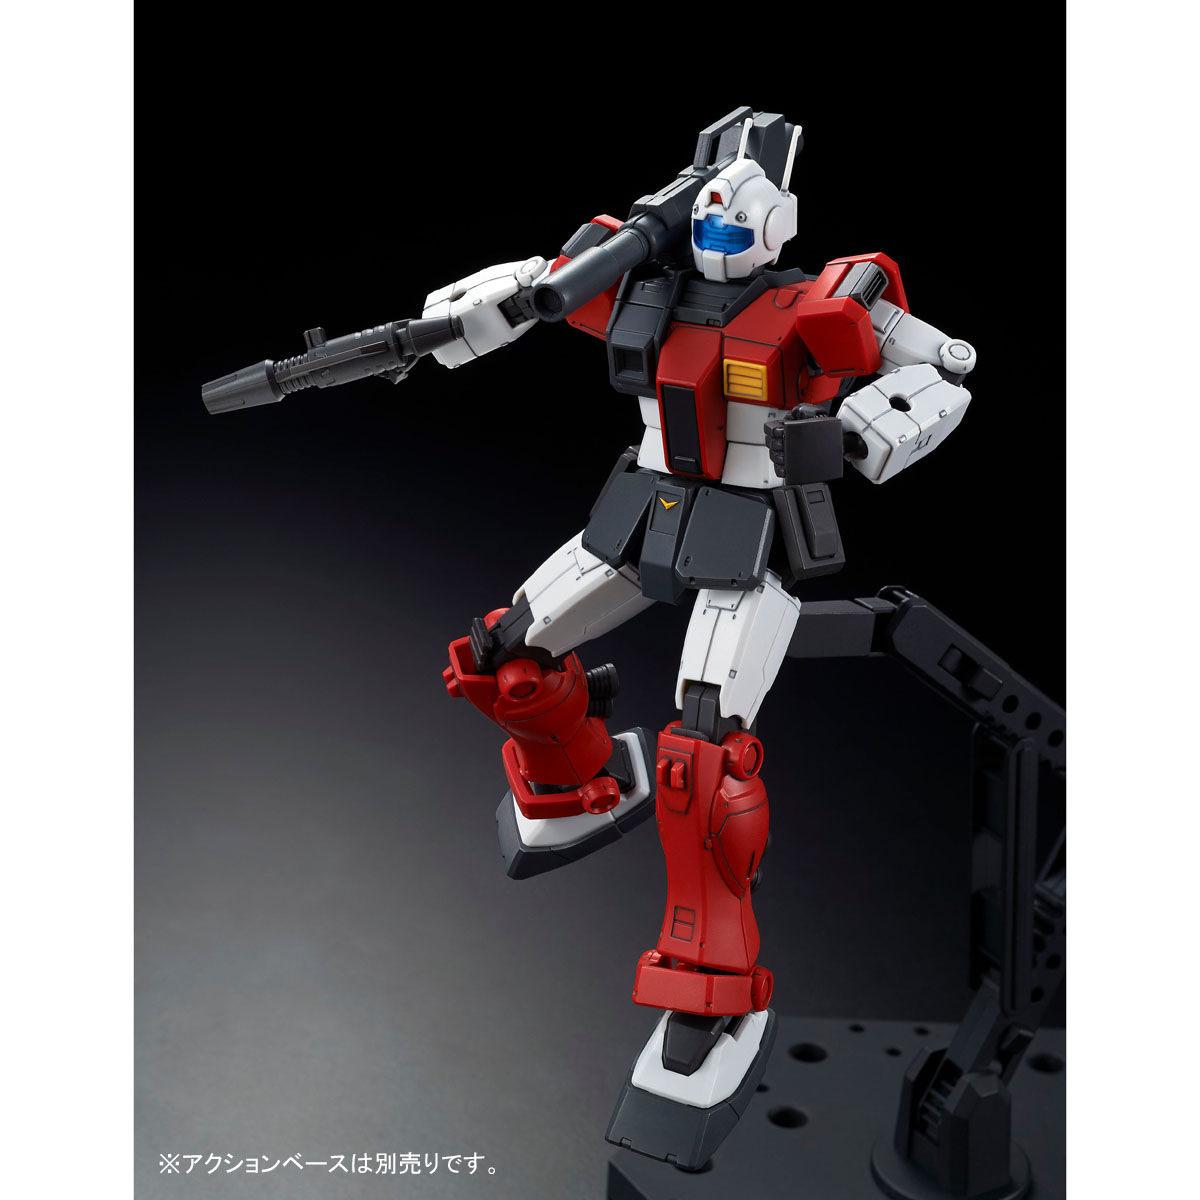 HG 1/144『ジム・キャノン(空間突撃仕様)』機動戦士ガンダム THE ORIGIN MSD プラモデル-008